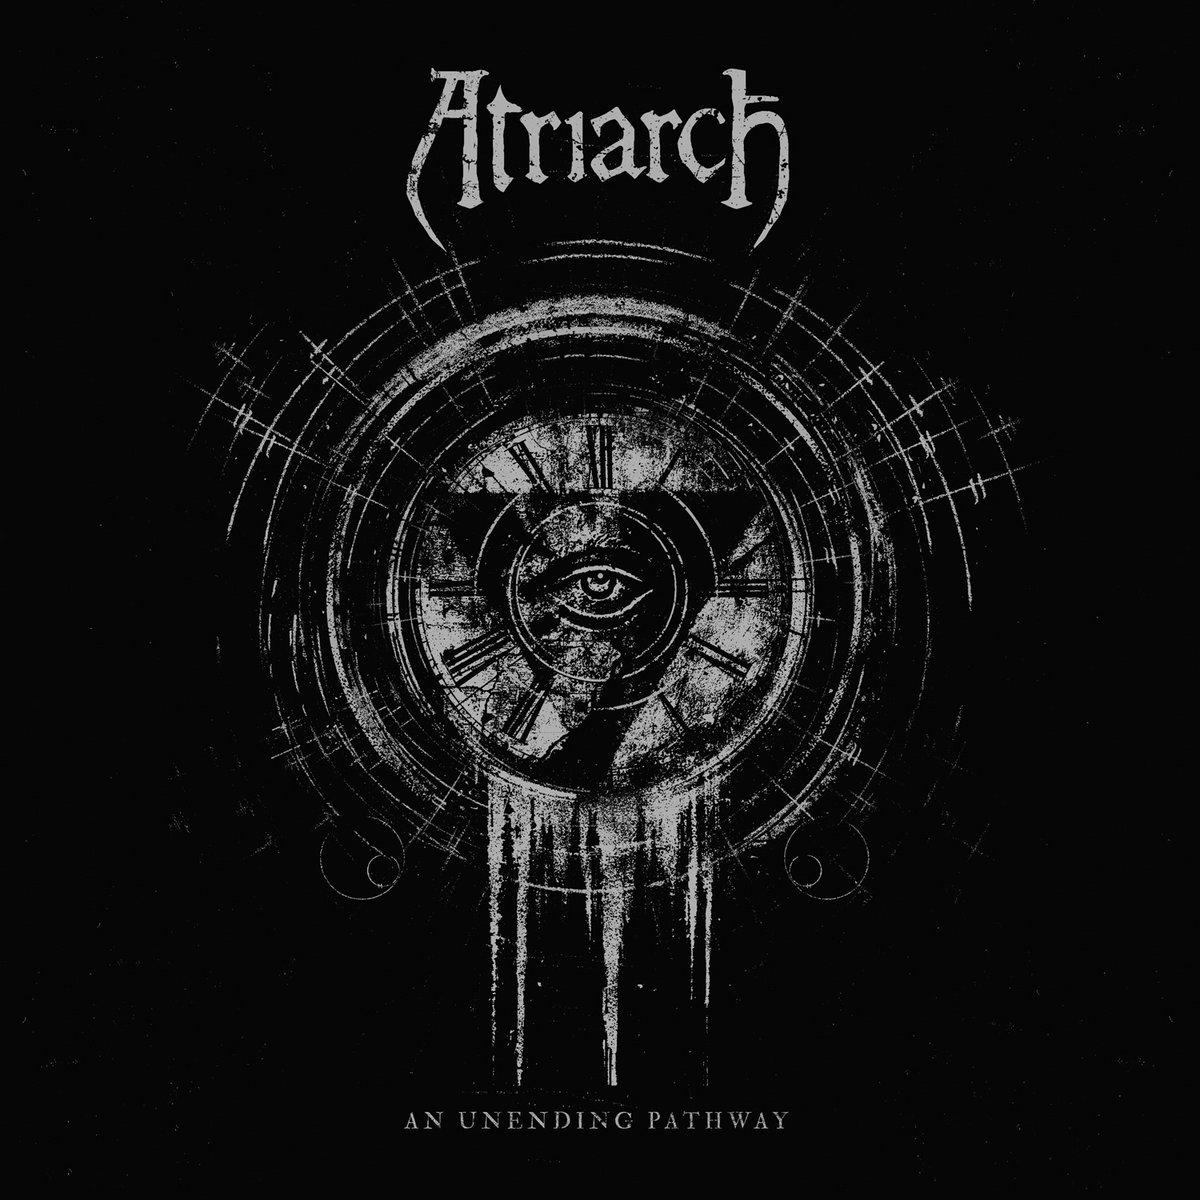 Atriarch An Unending Pathway artwork